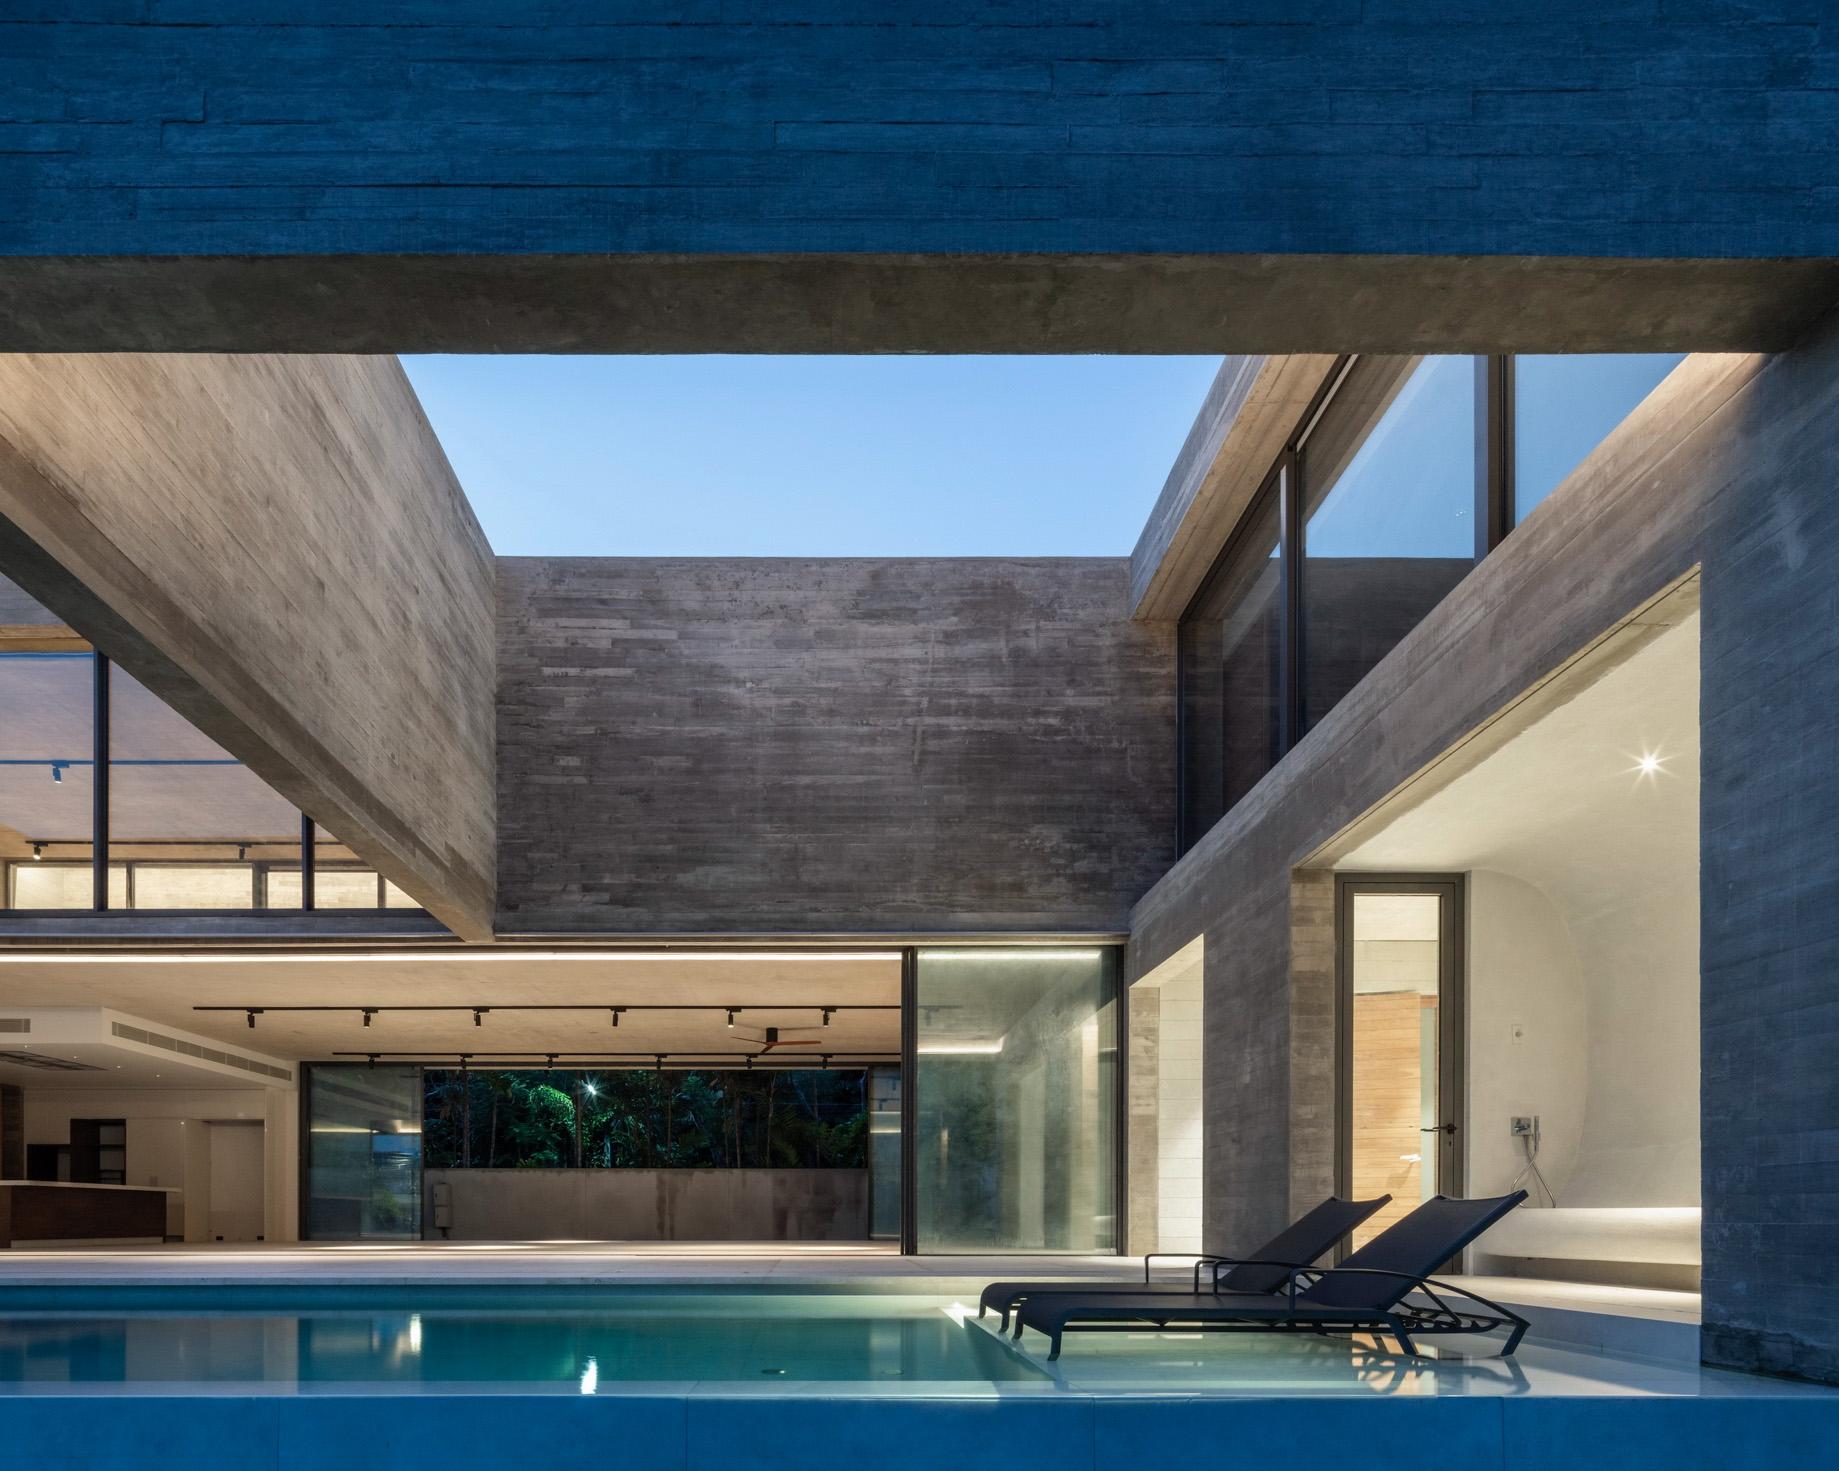 Casa de Alisa Luxury Residence - Nonthaburi, Thailand